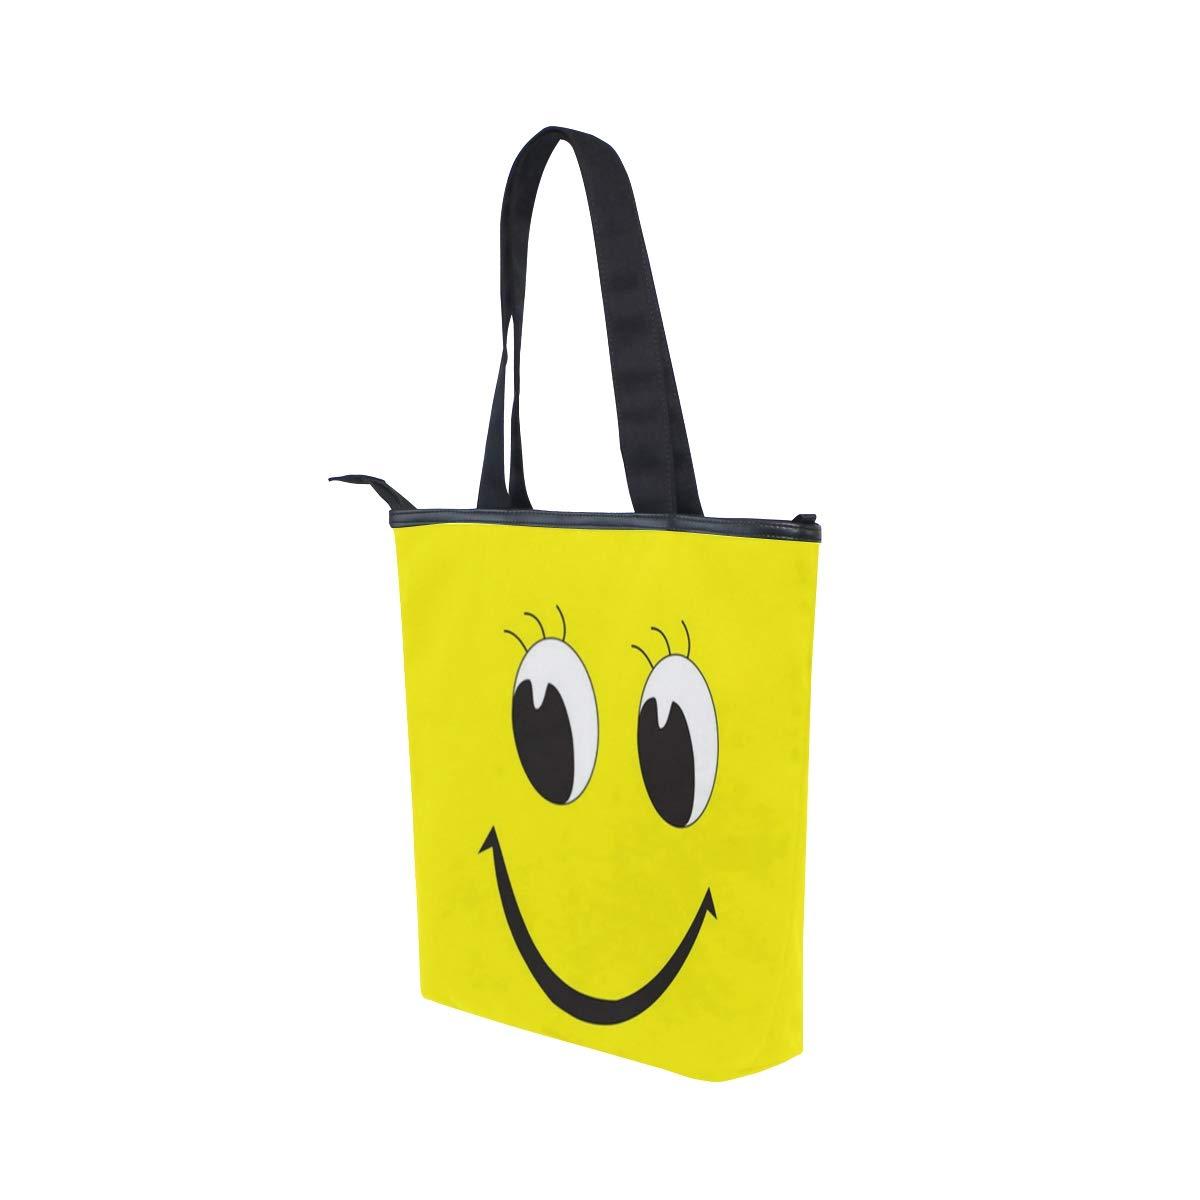 Jacksome Smiley Face Cute Smile Yellow Women Ladies Casual Vintage Hobo Canvas Daily Purse Shoulder Tote Shopper Handbag